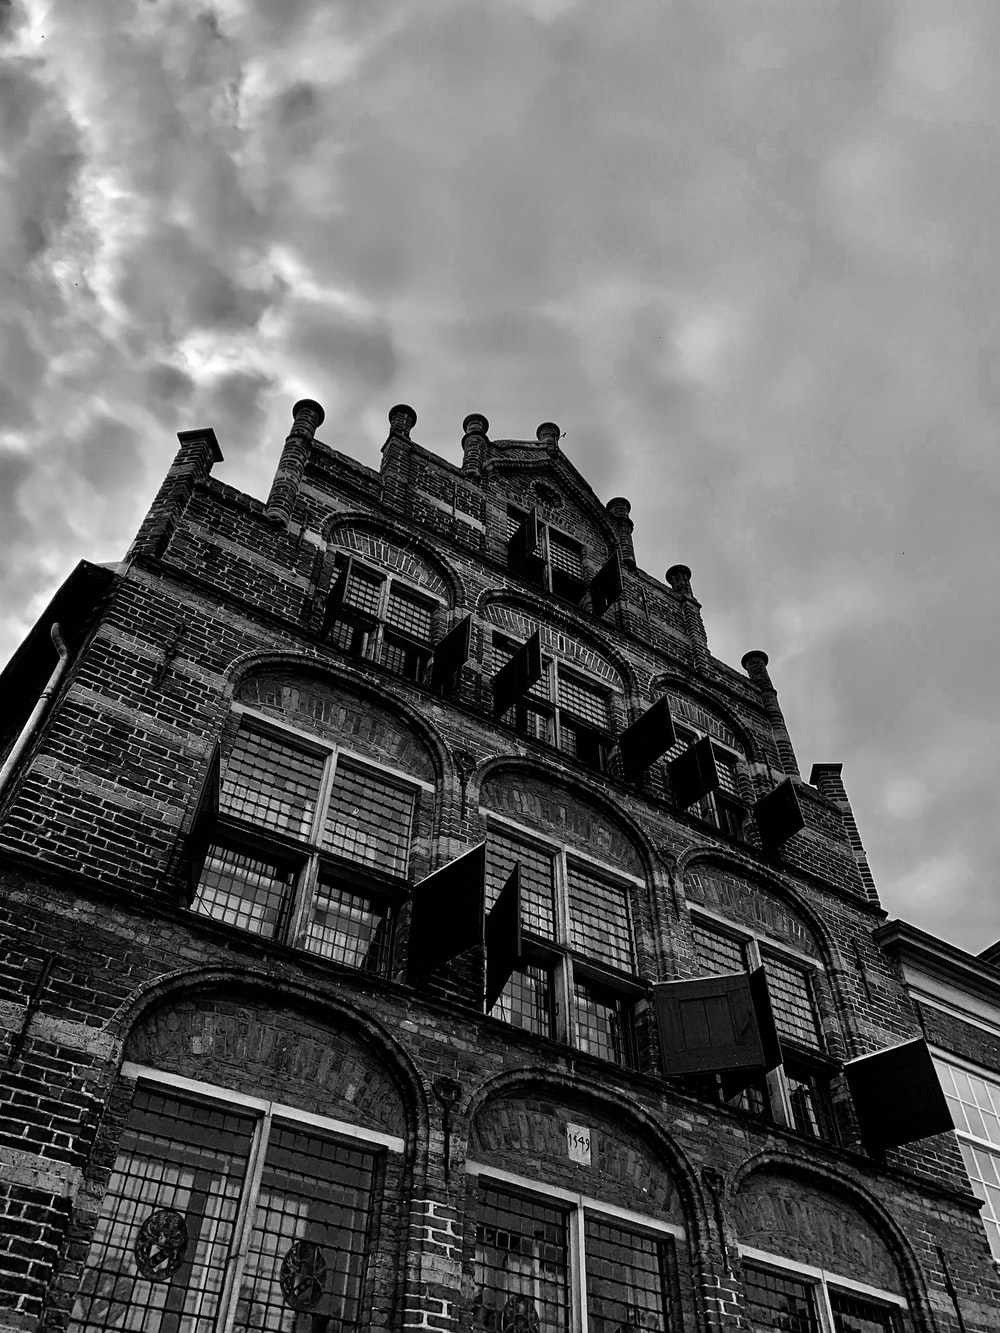 grey cloud hovering above antique brick building